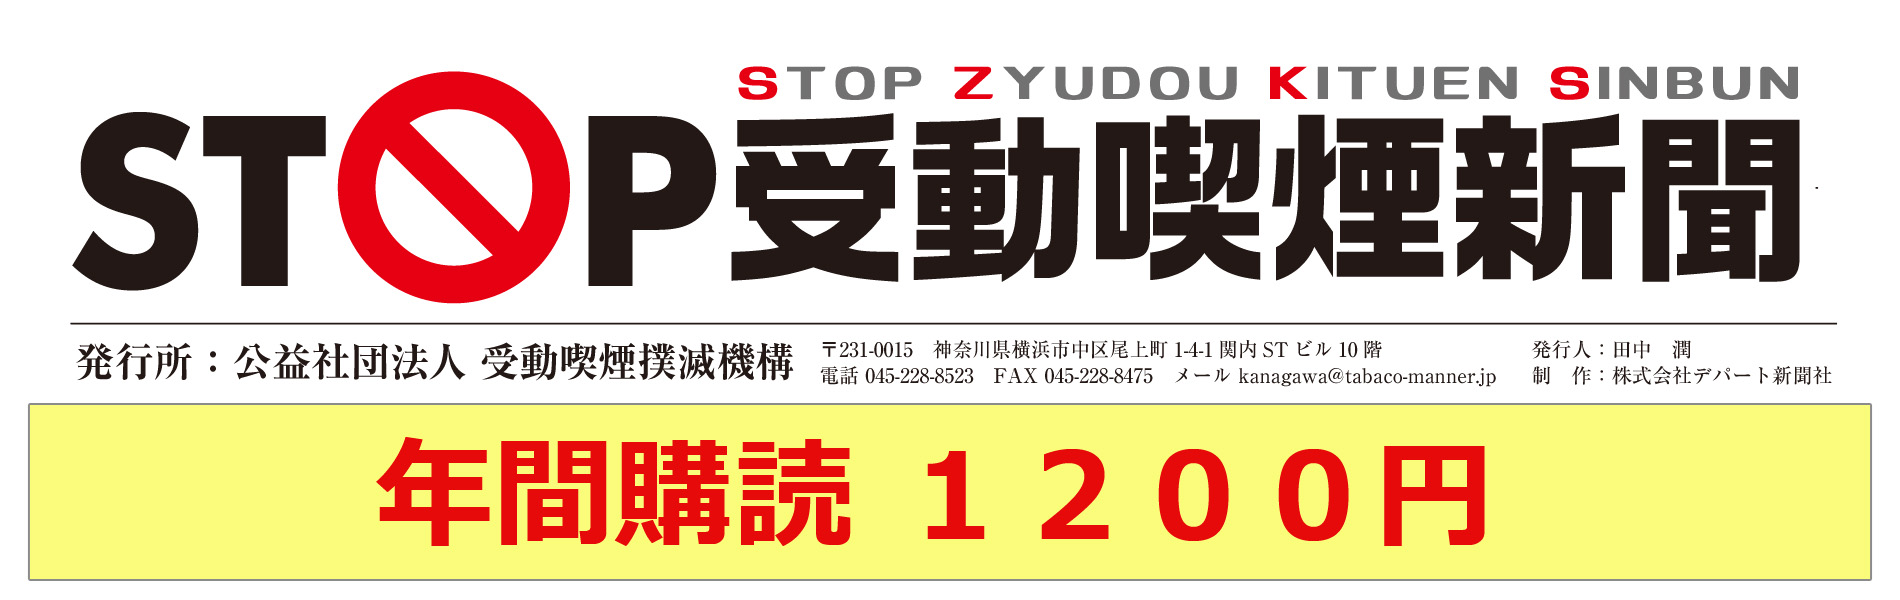 STOP受動喫煙新聞